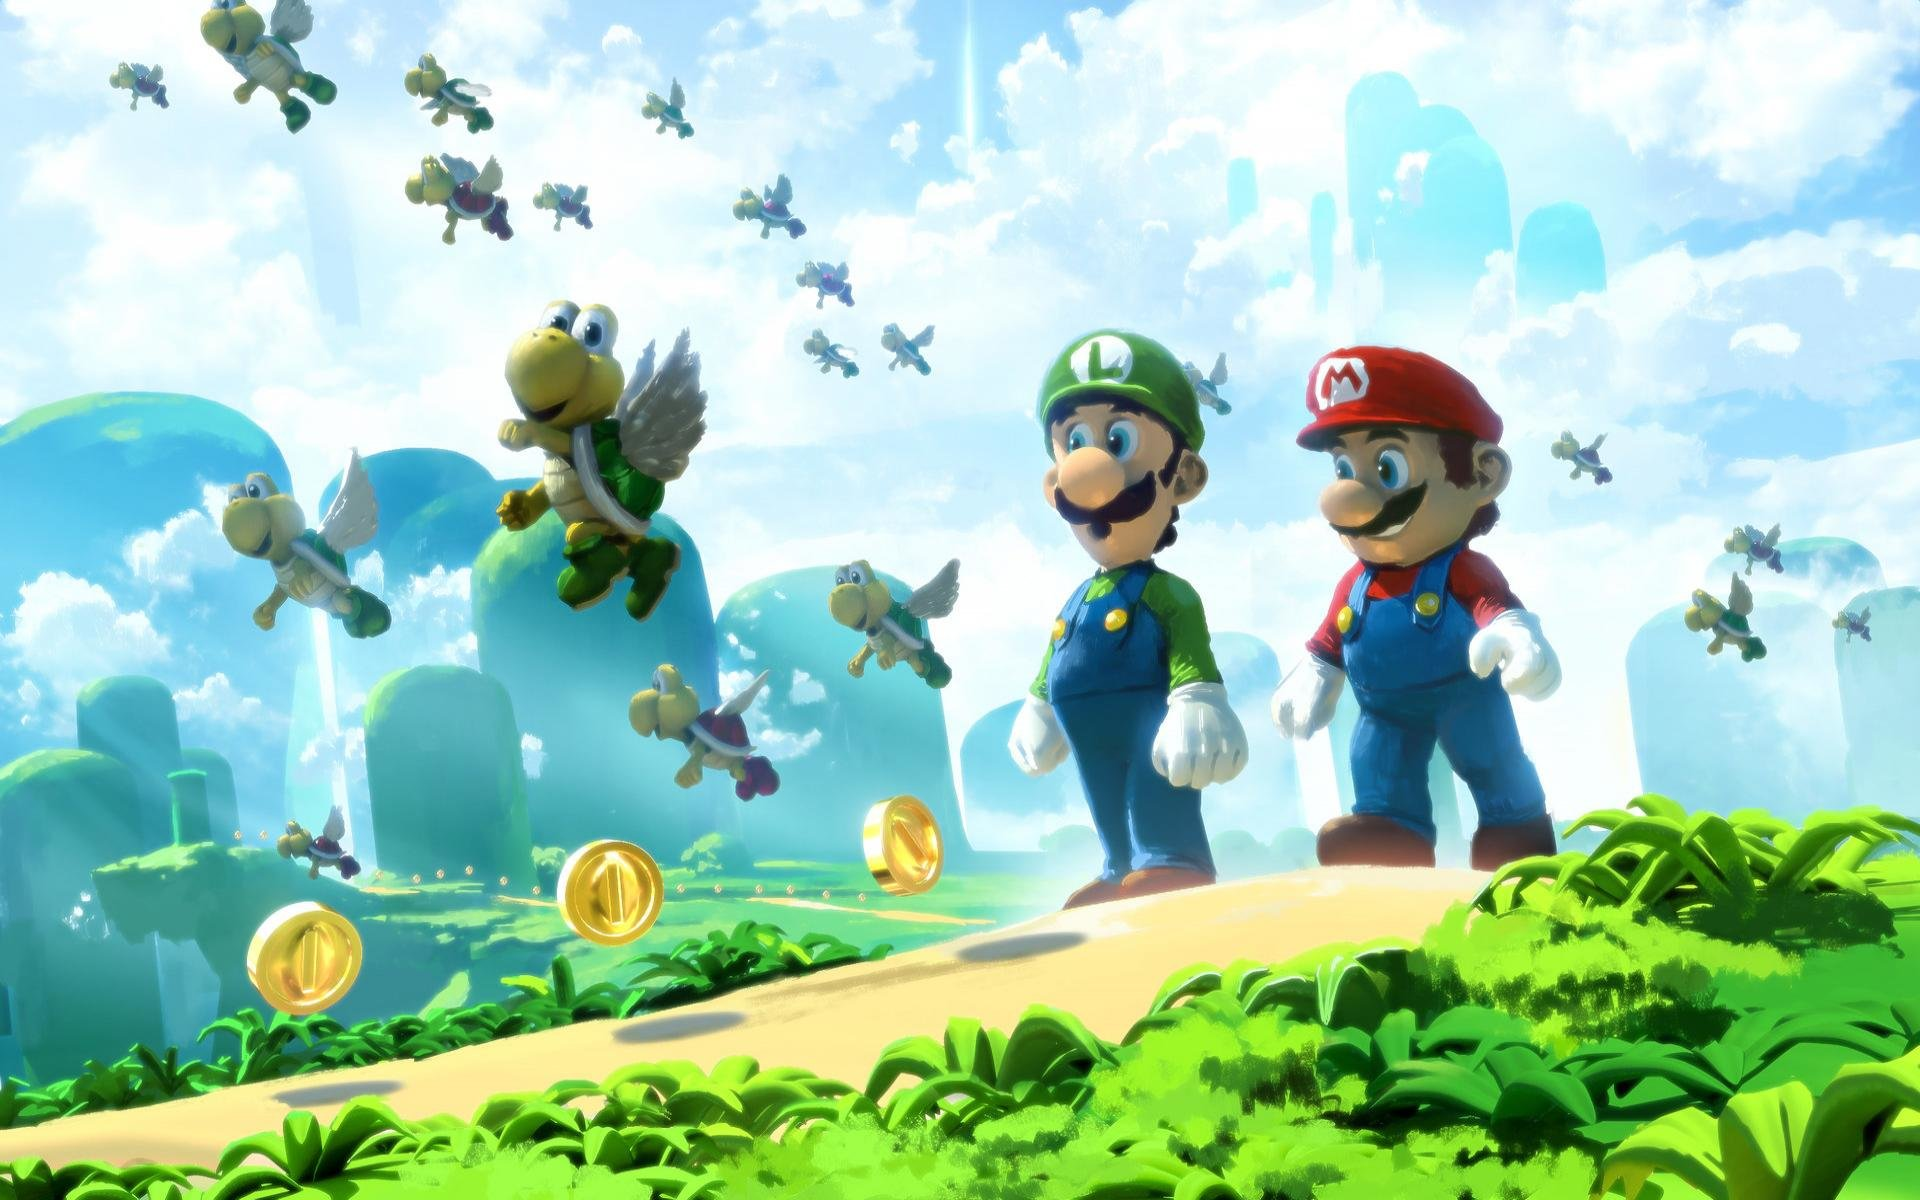 Luigi Wallpapers Hd For Desktop Backgrounds